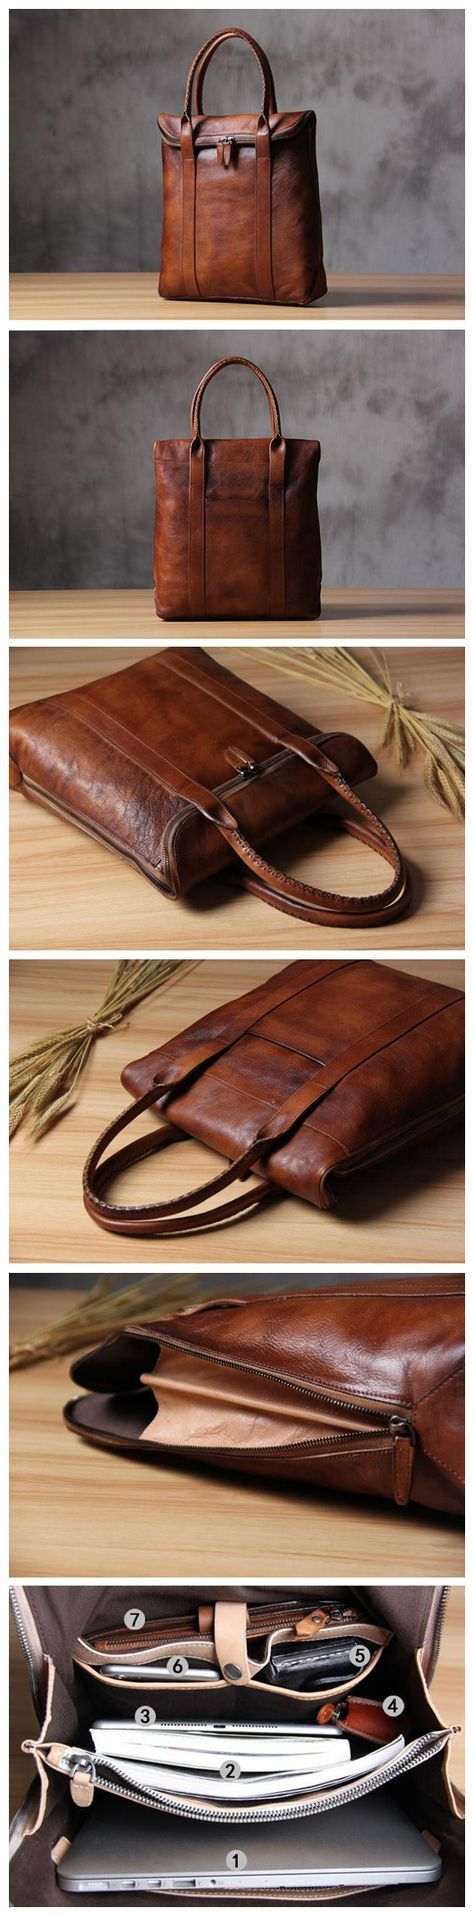 Leather Briefcase Men's Business Bag Handbag Men Fashion Laptop Bag 14118 Overview: Design: Vintage Leather Men Briefcase In Stock: 4-5 days For Making Include: Only Leather Briefcase Custom: No Color